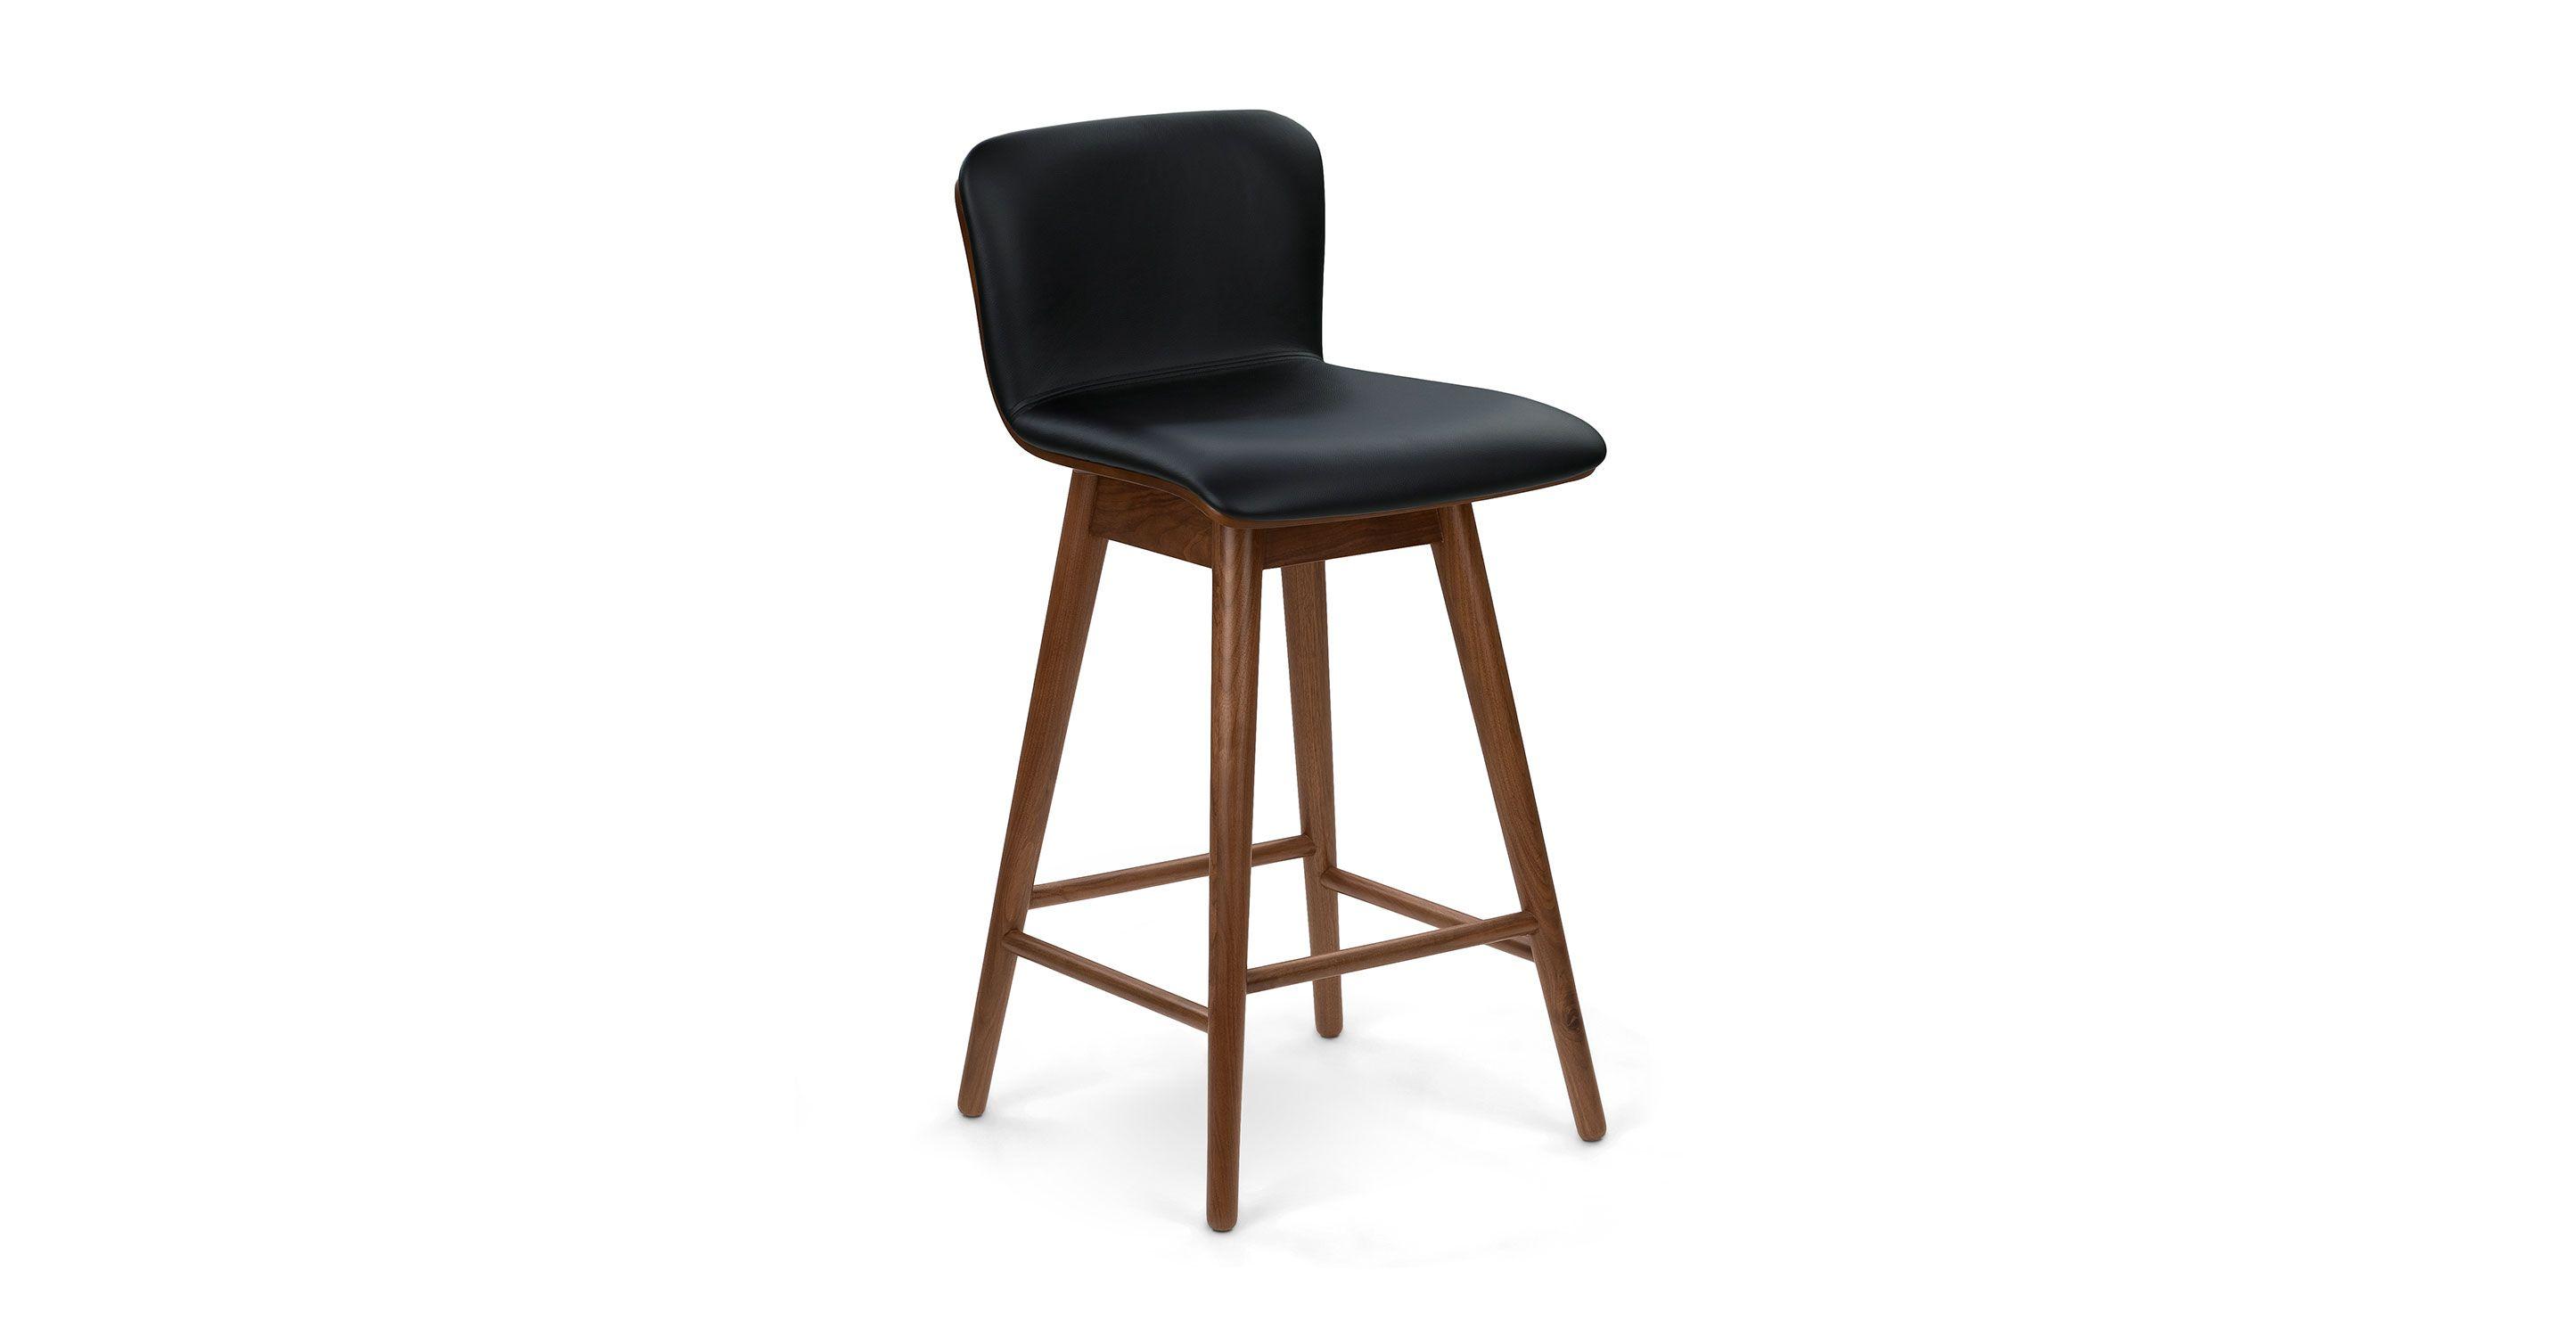 Sede Toscana Tan Oak Swivel Counter Stool Swivel Counter Stools Counter Stools Walnut Dining Chair